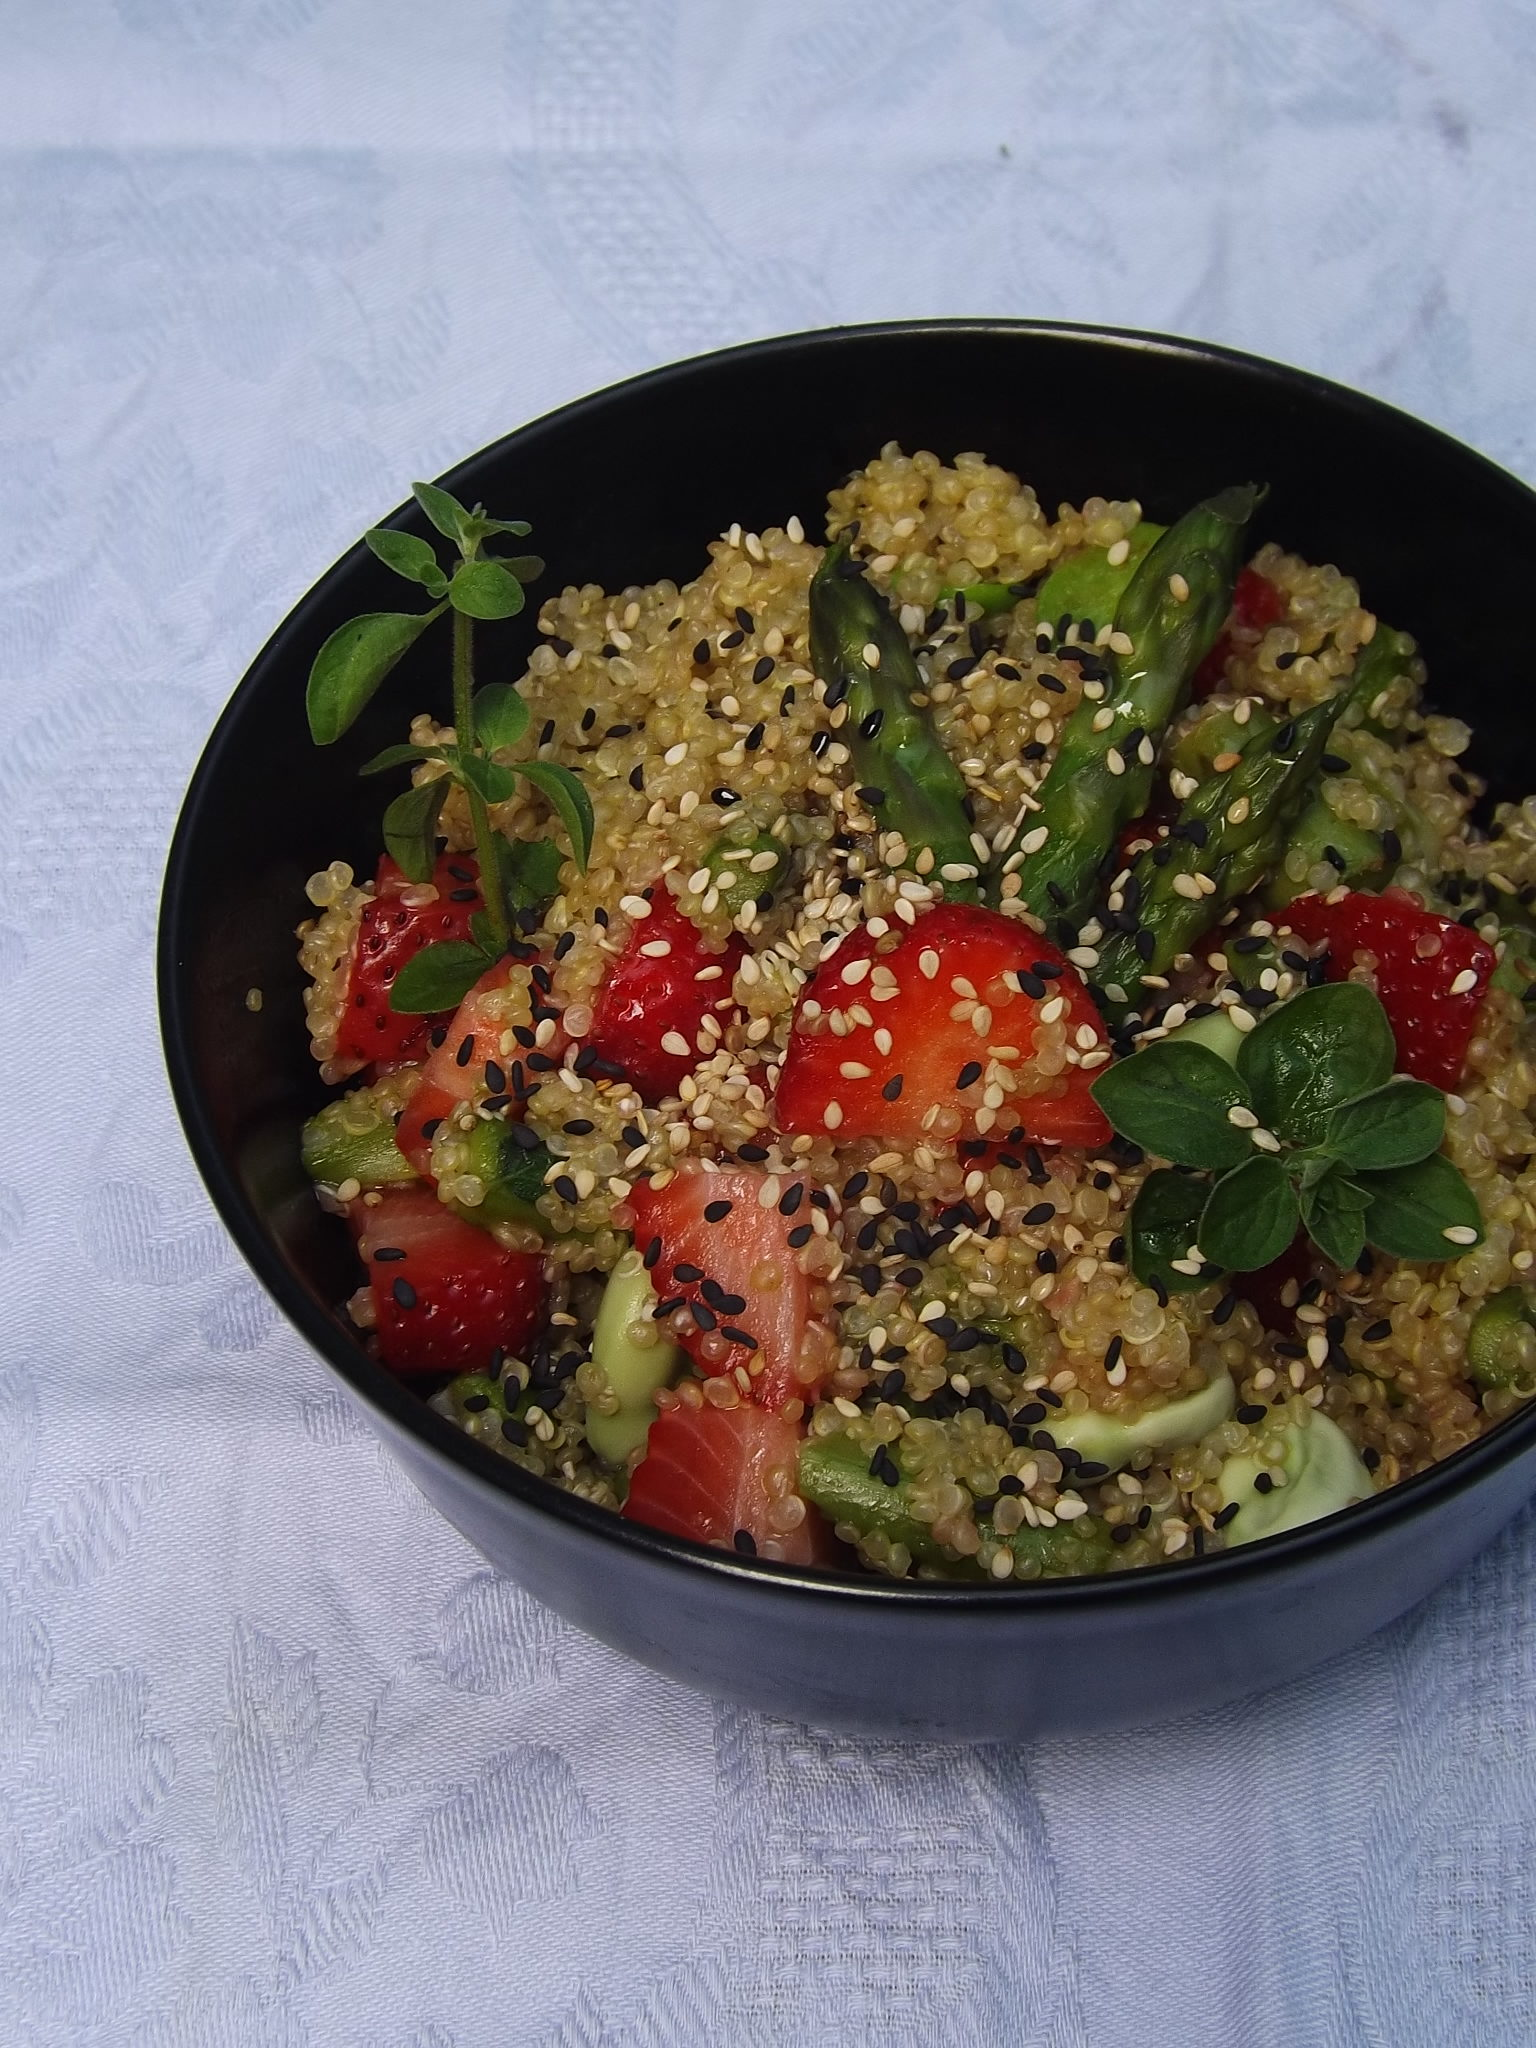 Strawberry, asparagus and fresh fava bean salad